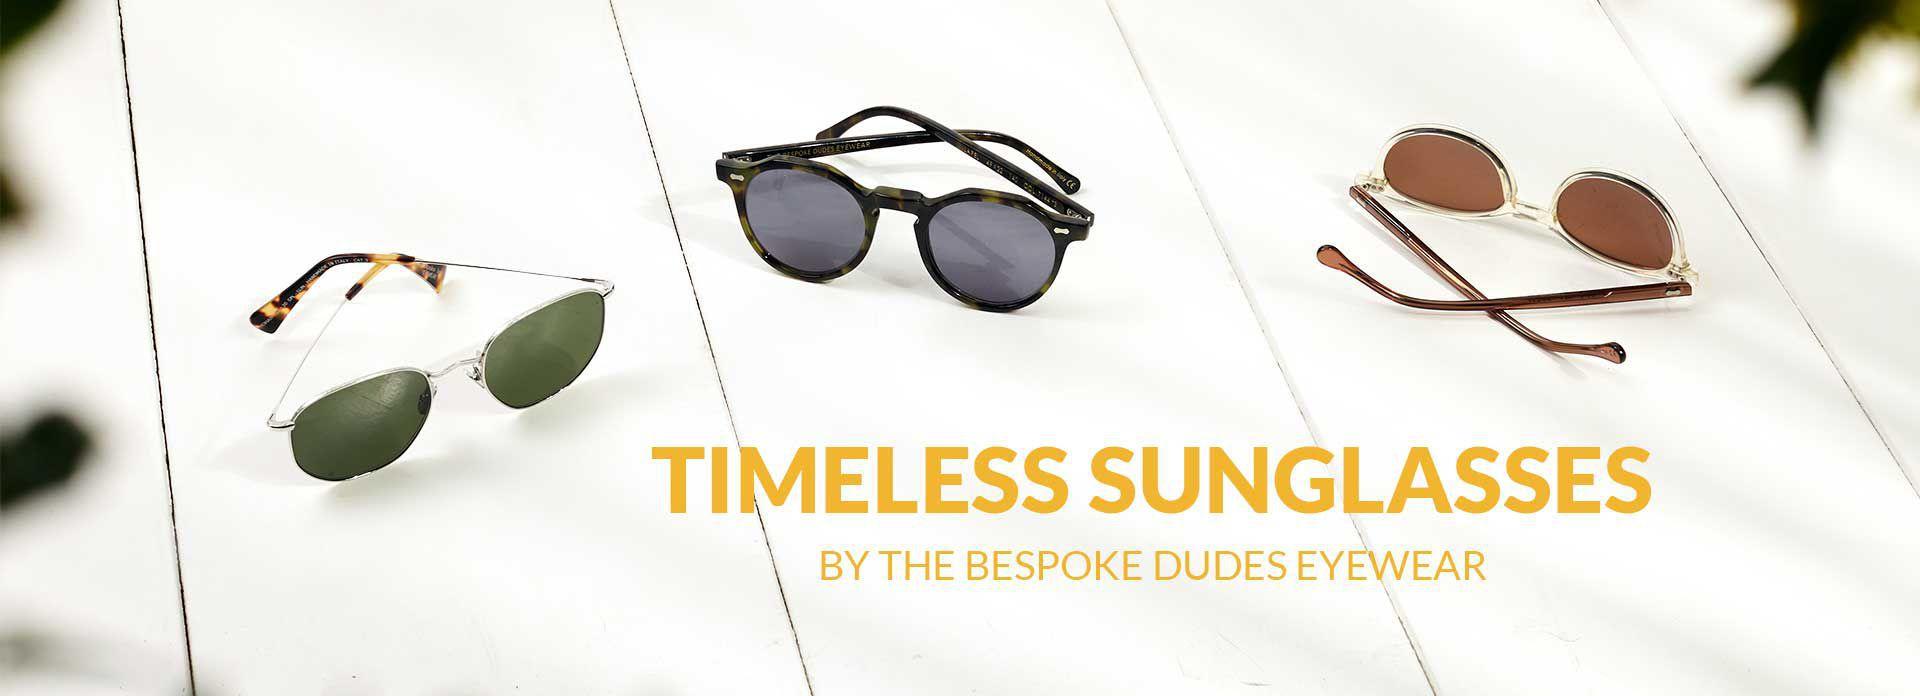 Sunglasses. Models: Mohair, Lapel and Cran by The Bespoke Dudes Eyewear.